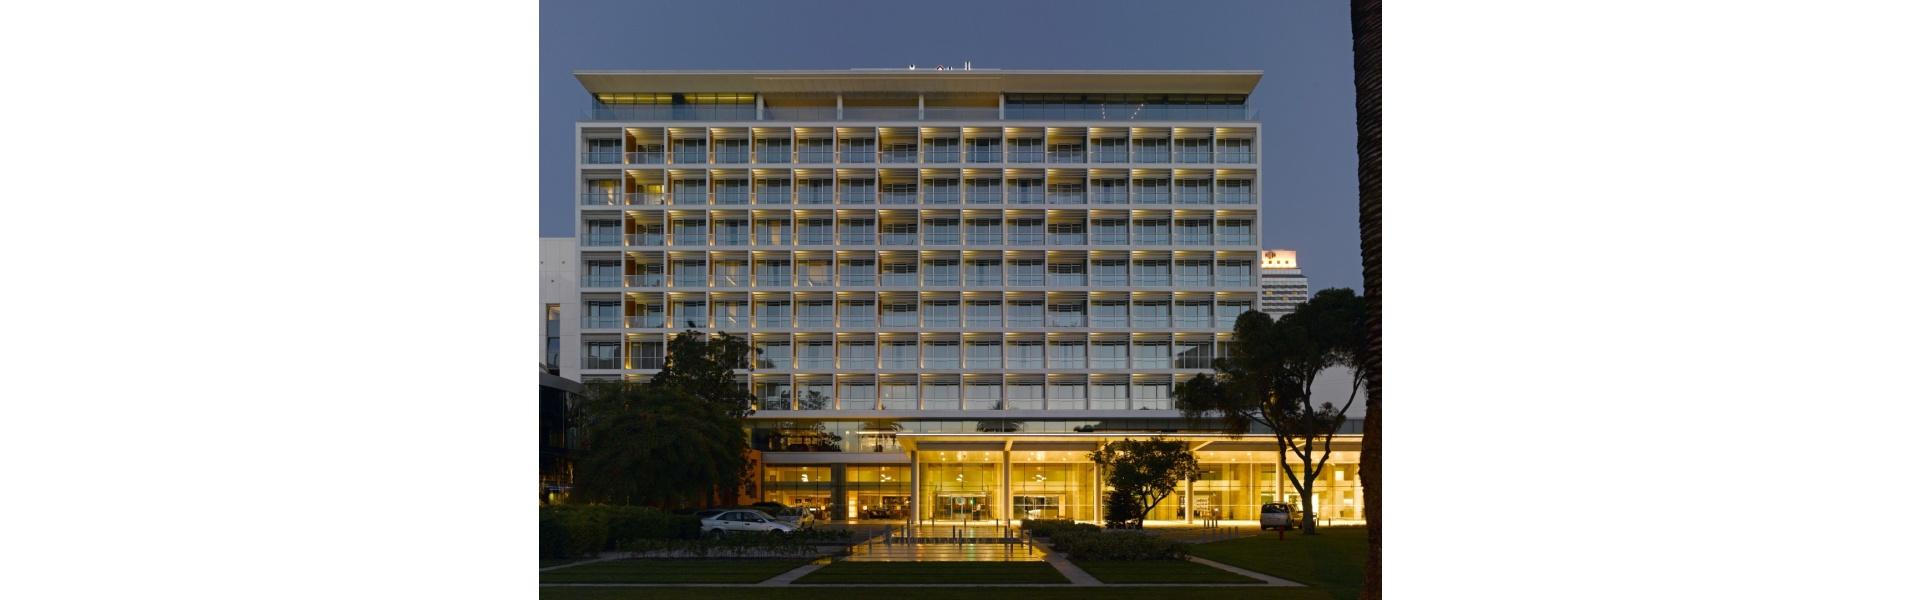 Swissotel Izmir The Grand Hotel Efes 001